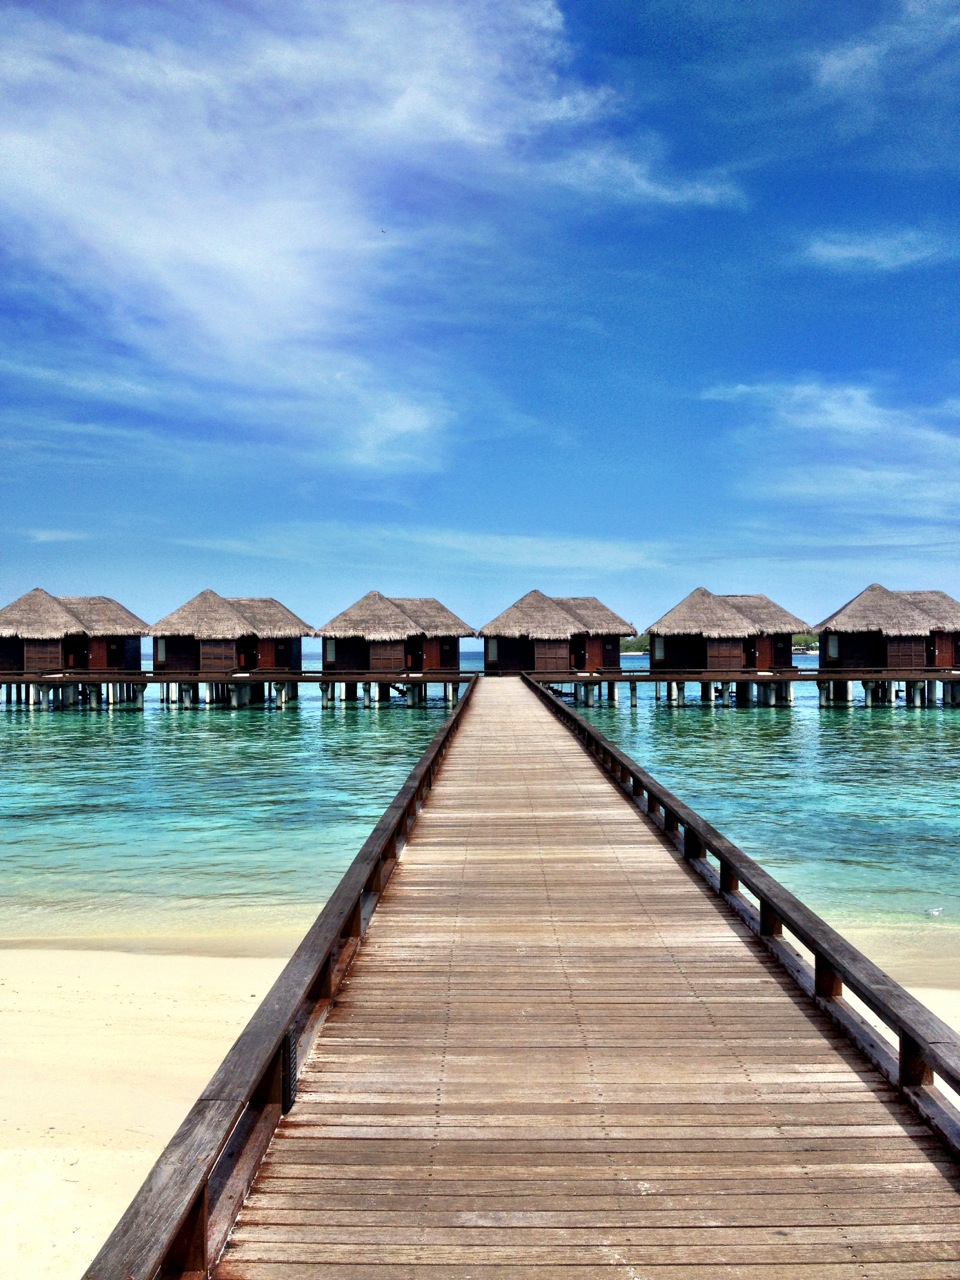 Maldives Part 2: Luxury Living